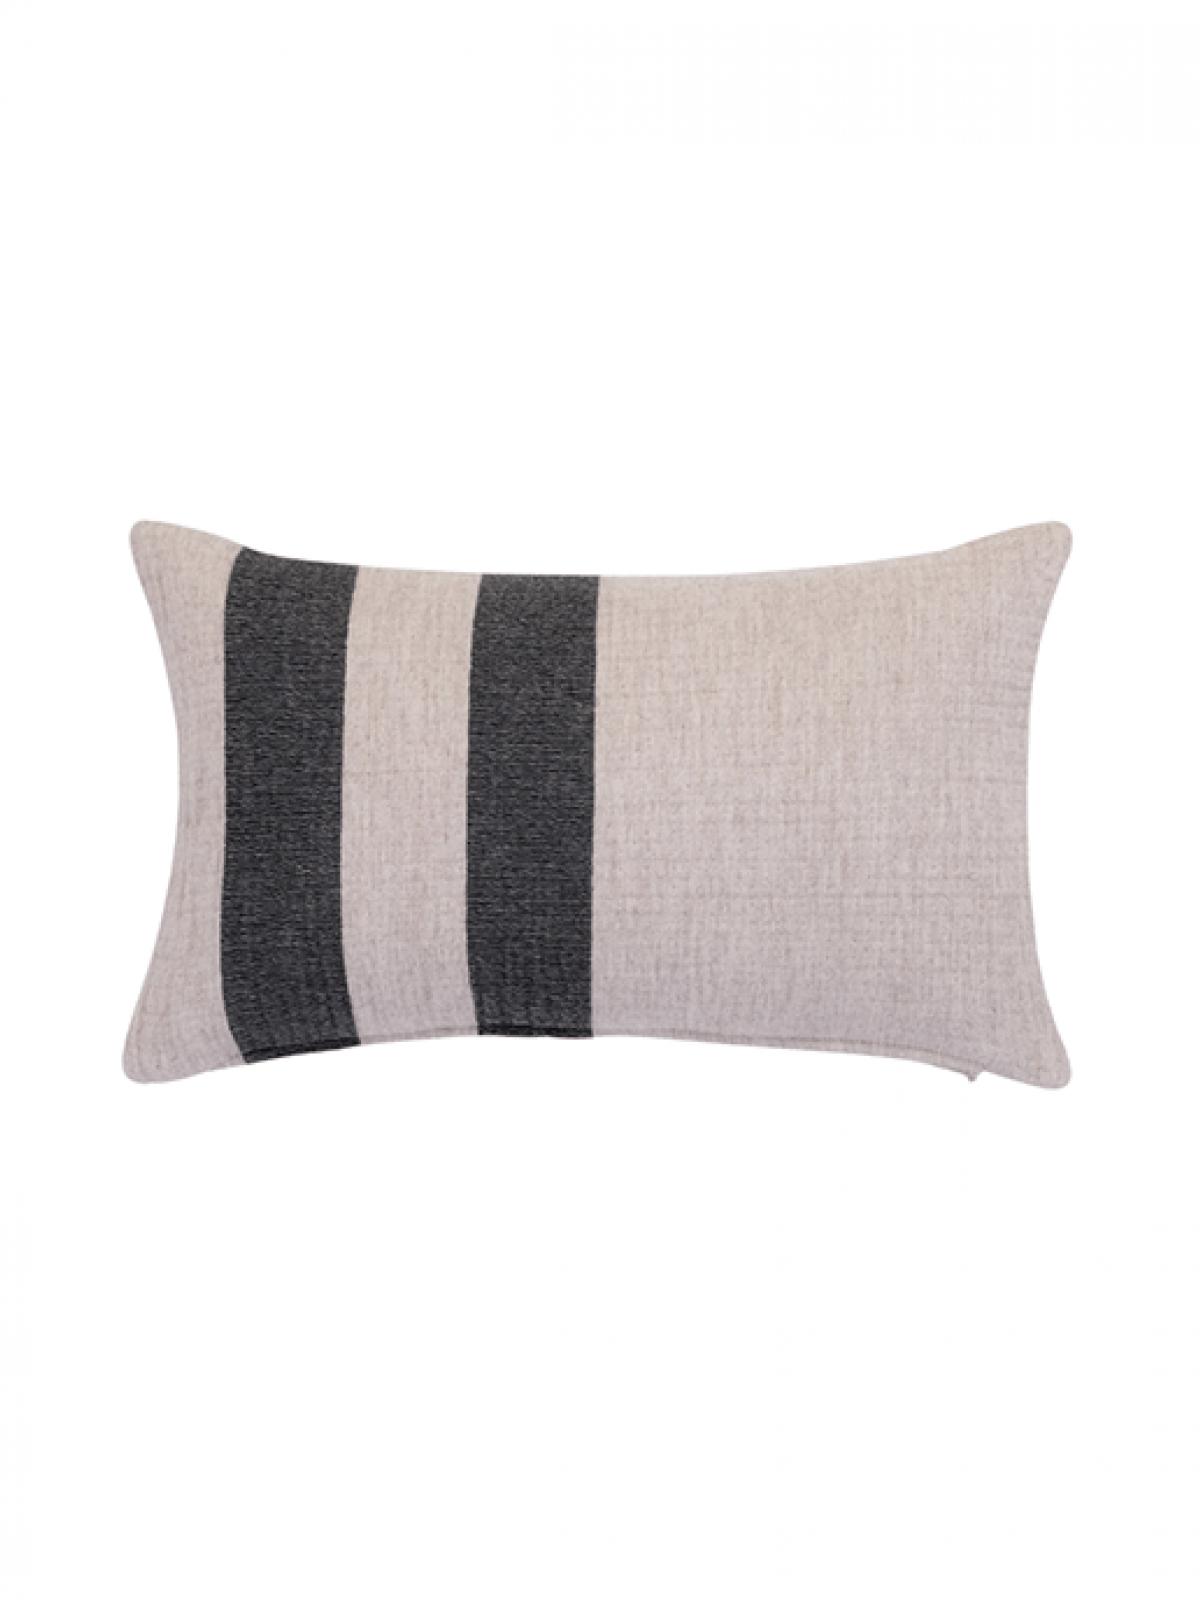 woolcocoon-cushion-ecrublack-1200x1600h